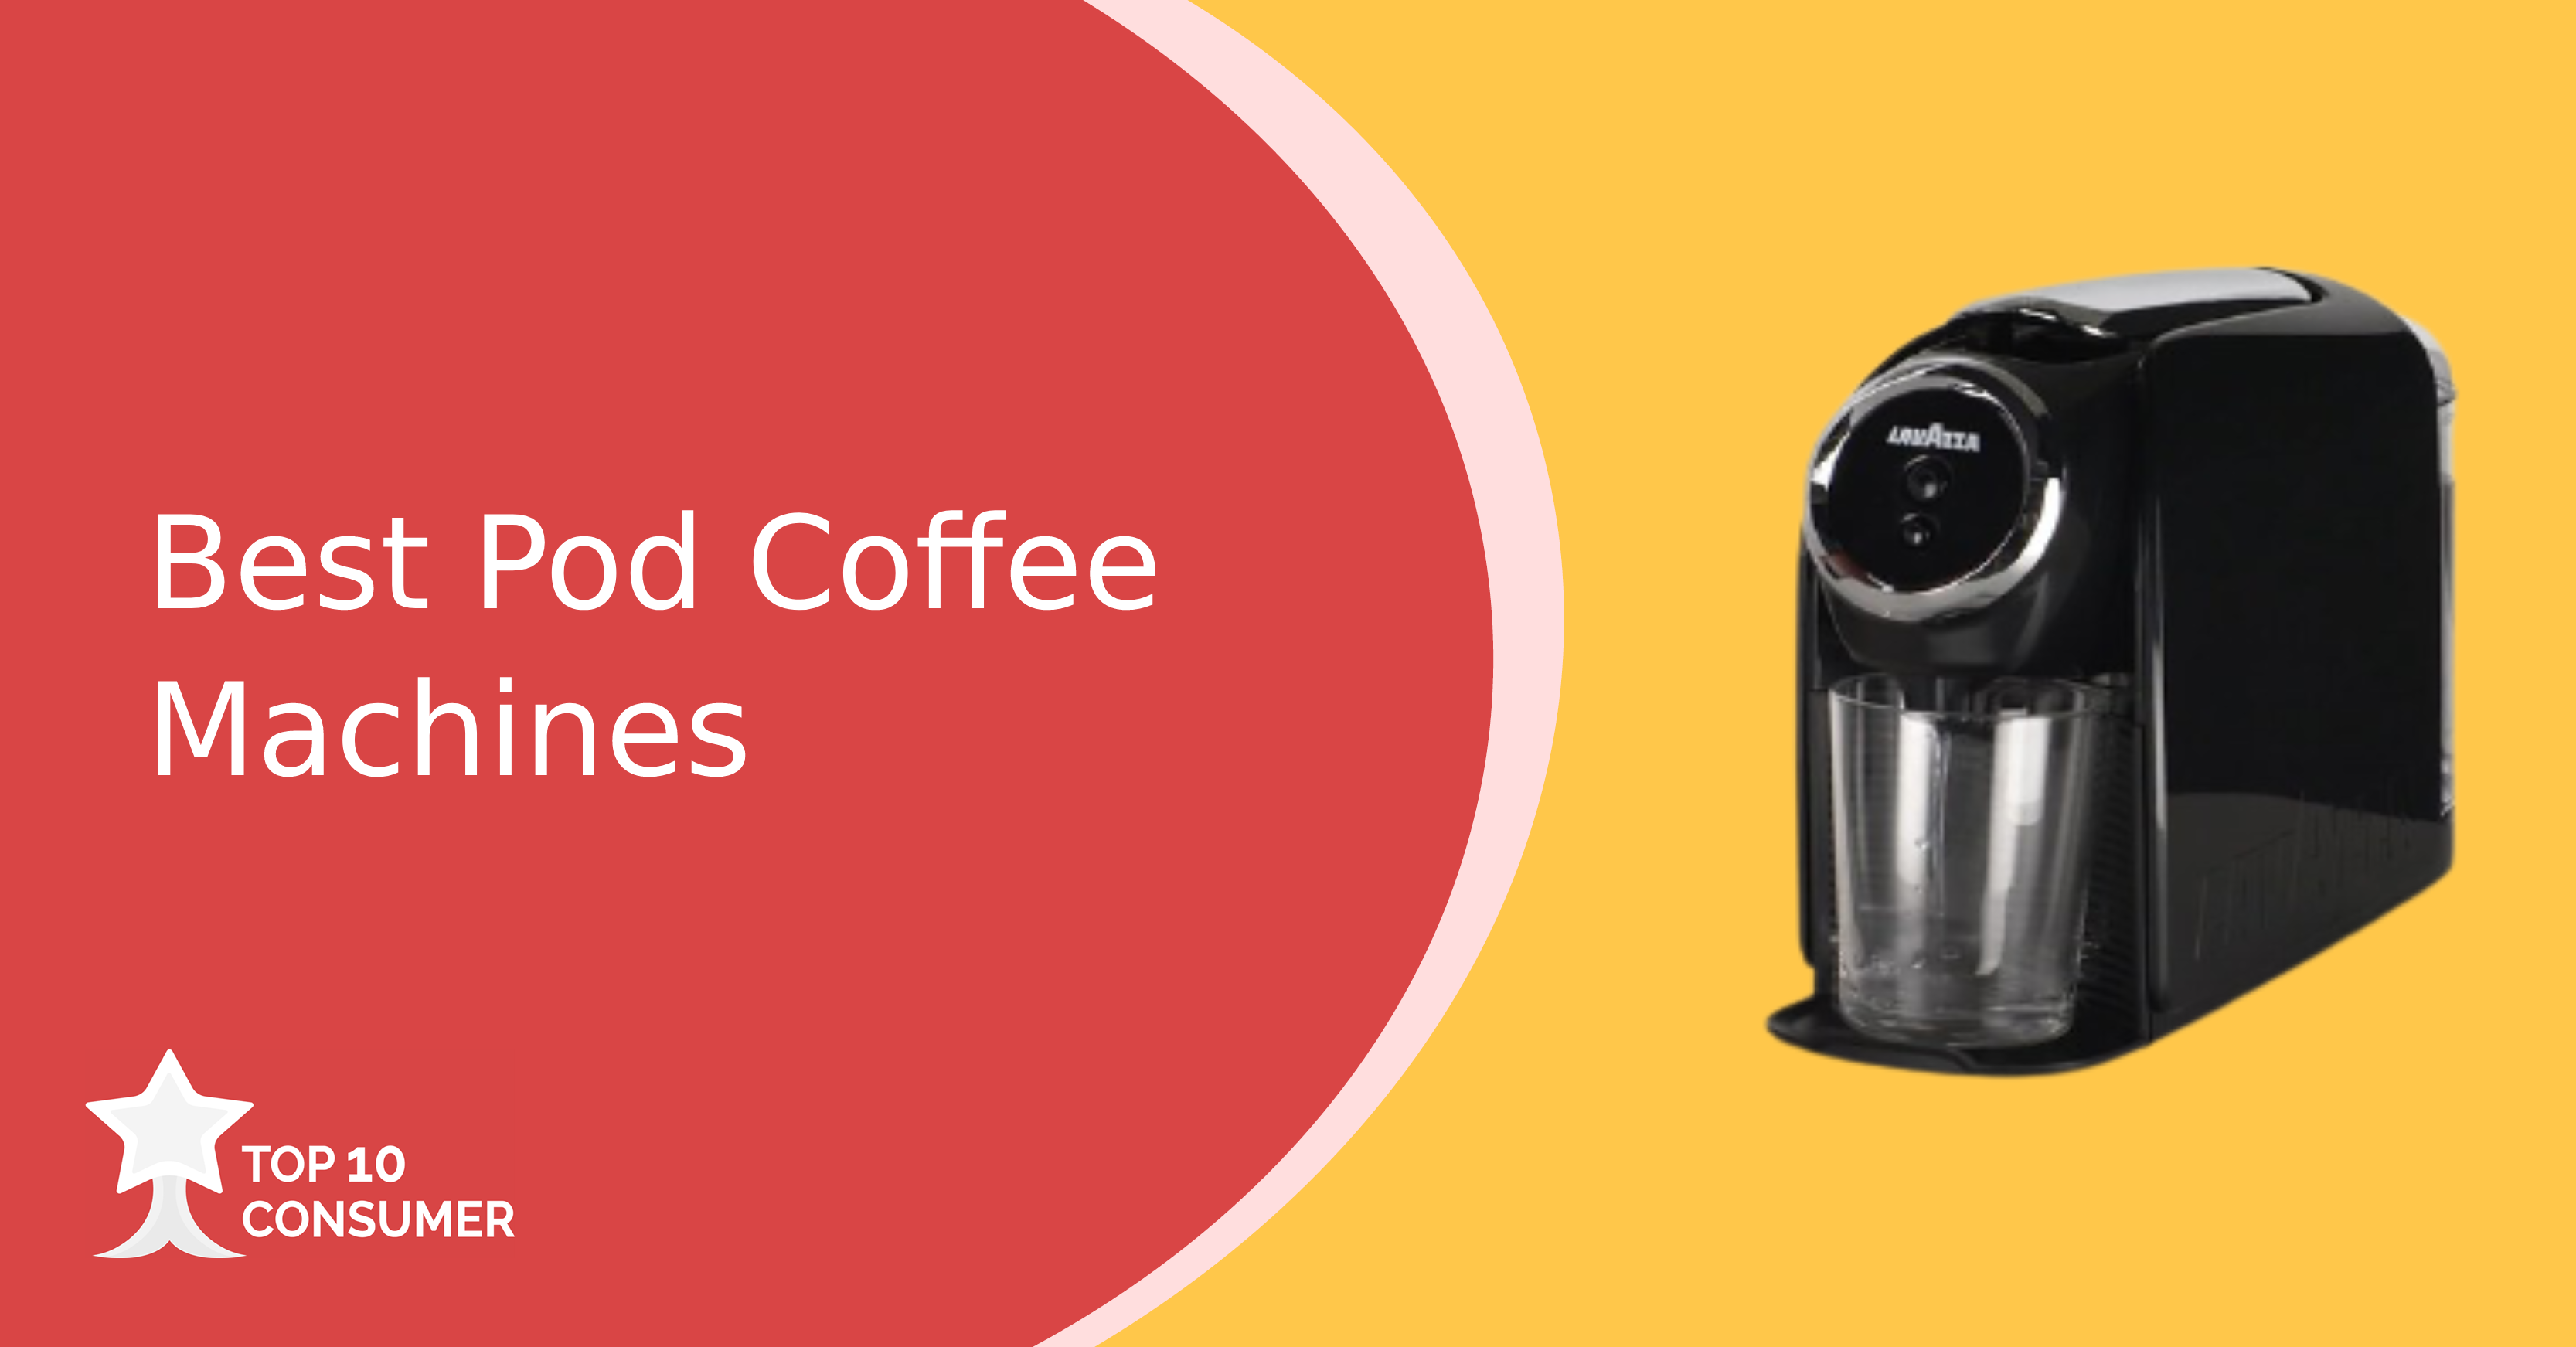 Best Pod Coffee Machines